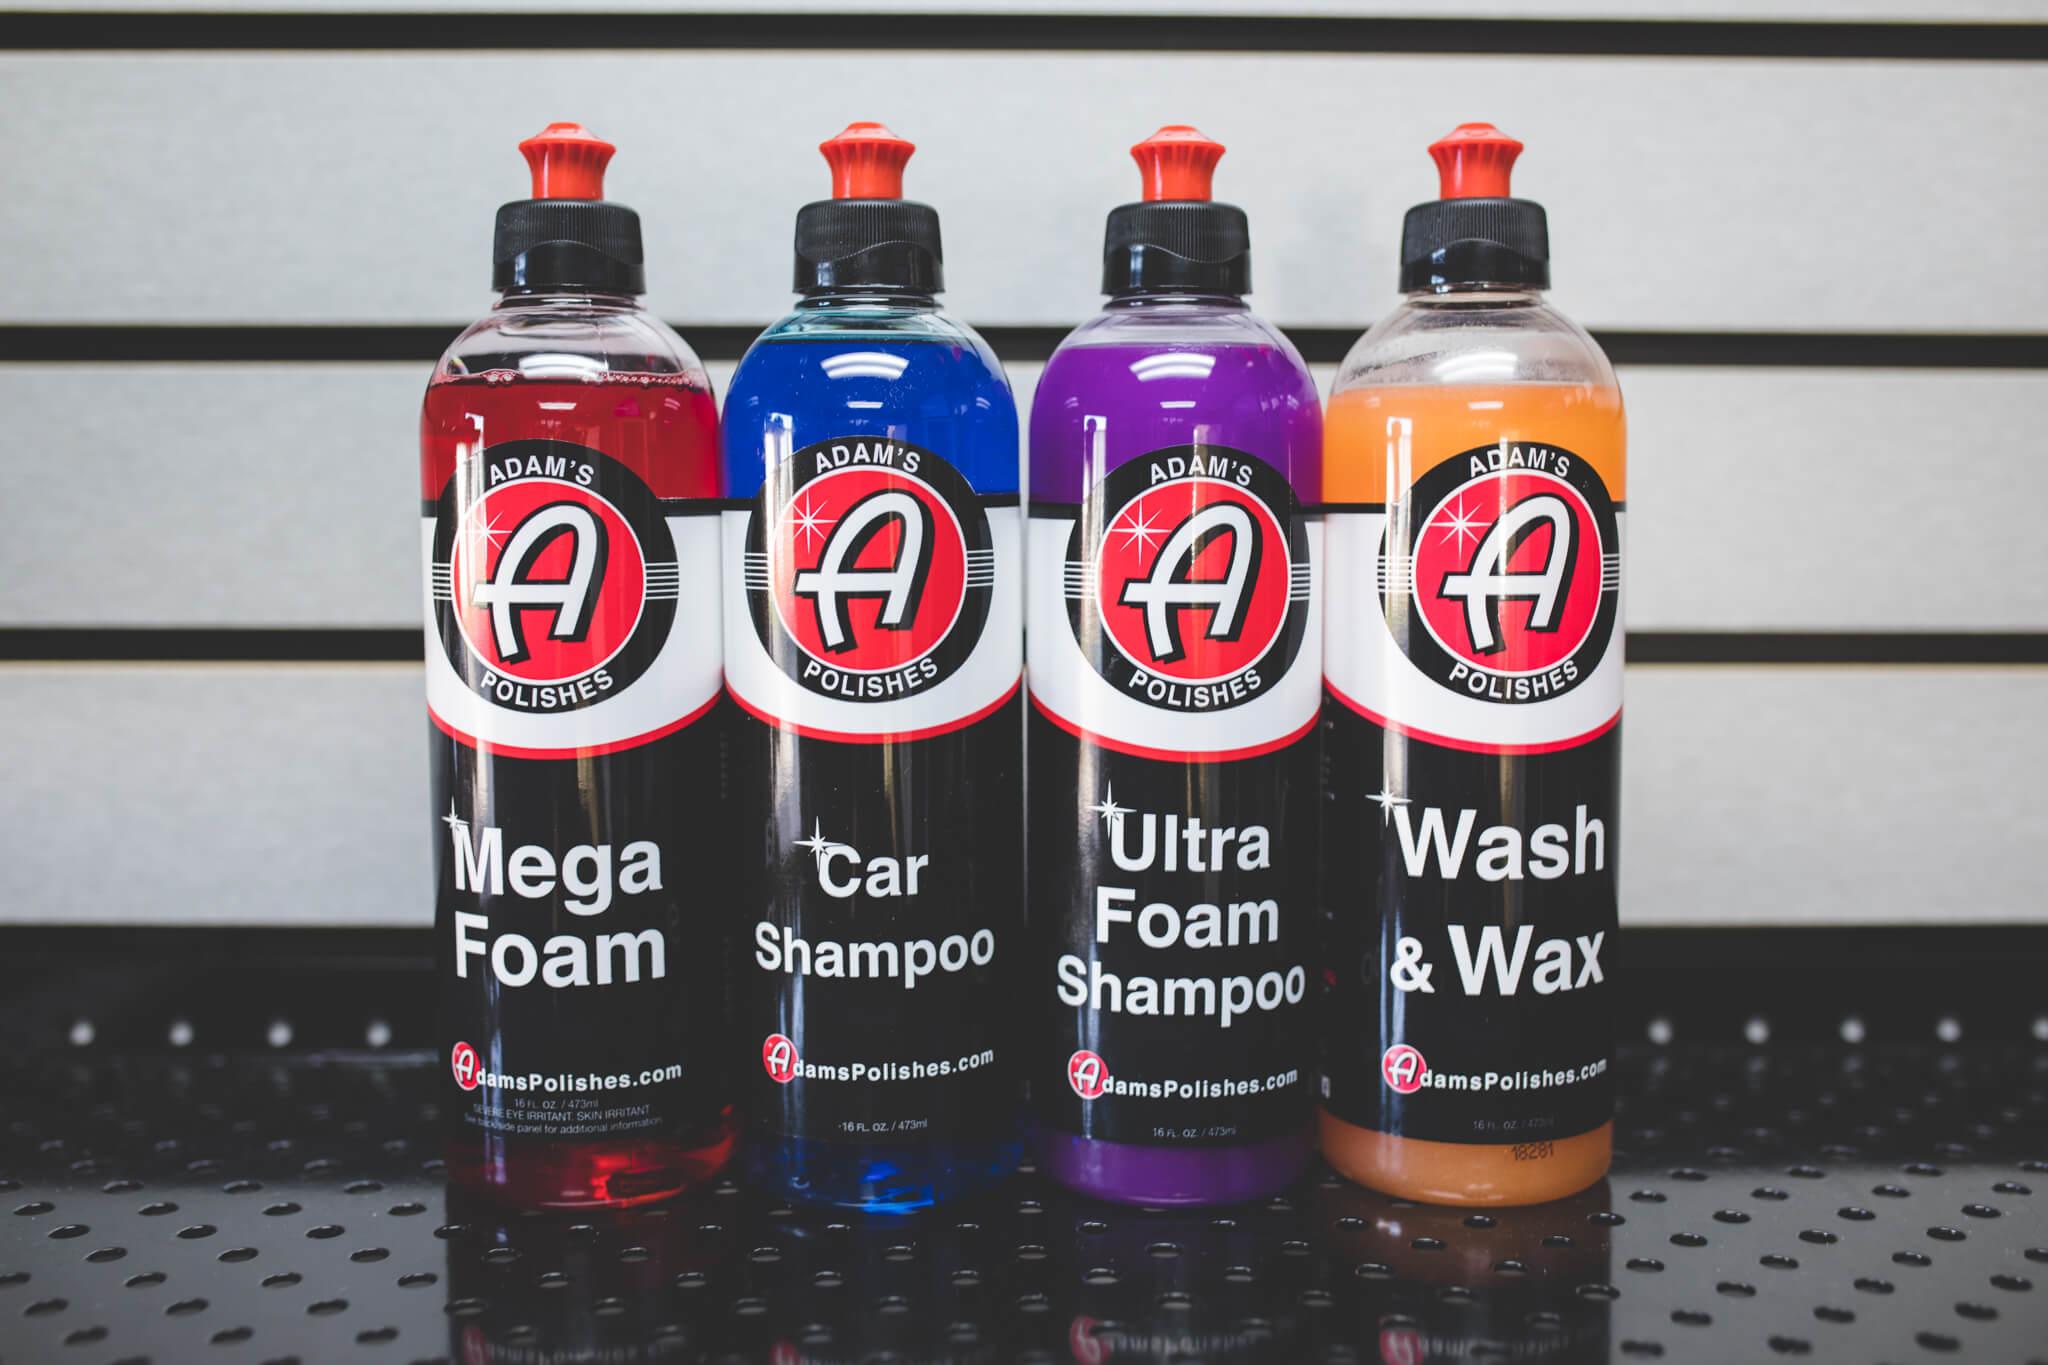 Adam's Car Shampoo vs Ultra Foam vs Mega Foam vs Wash & Wax